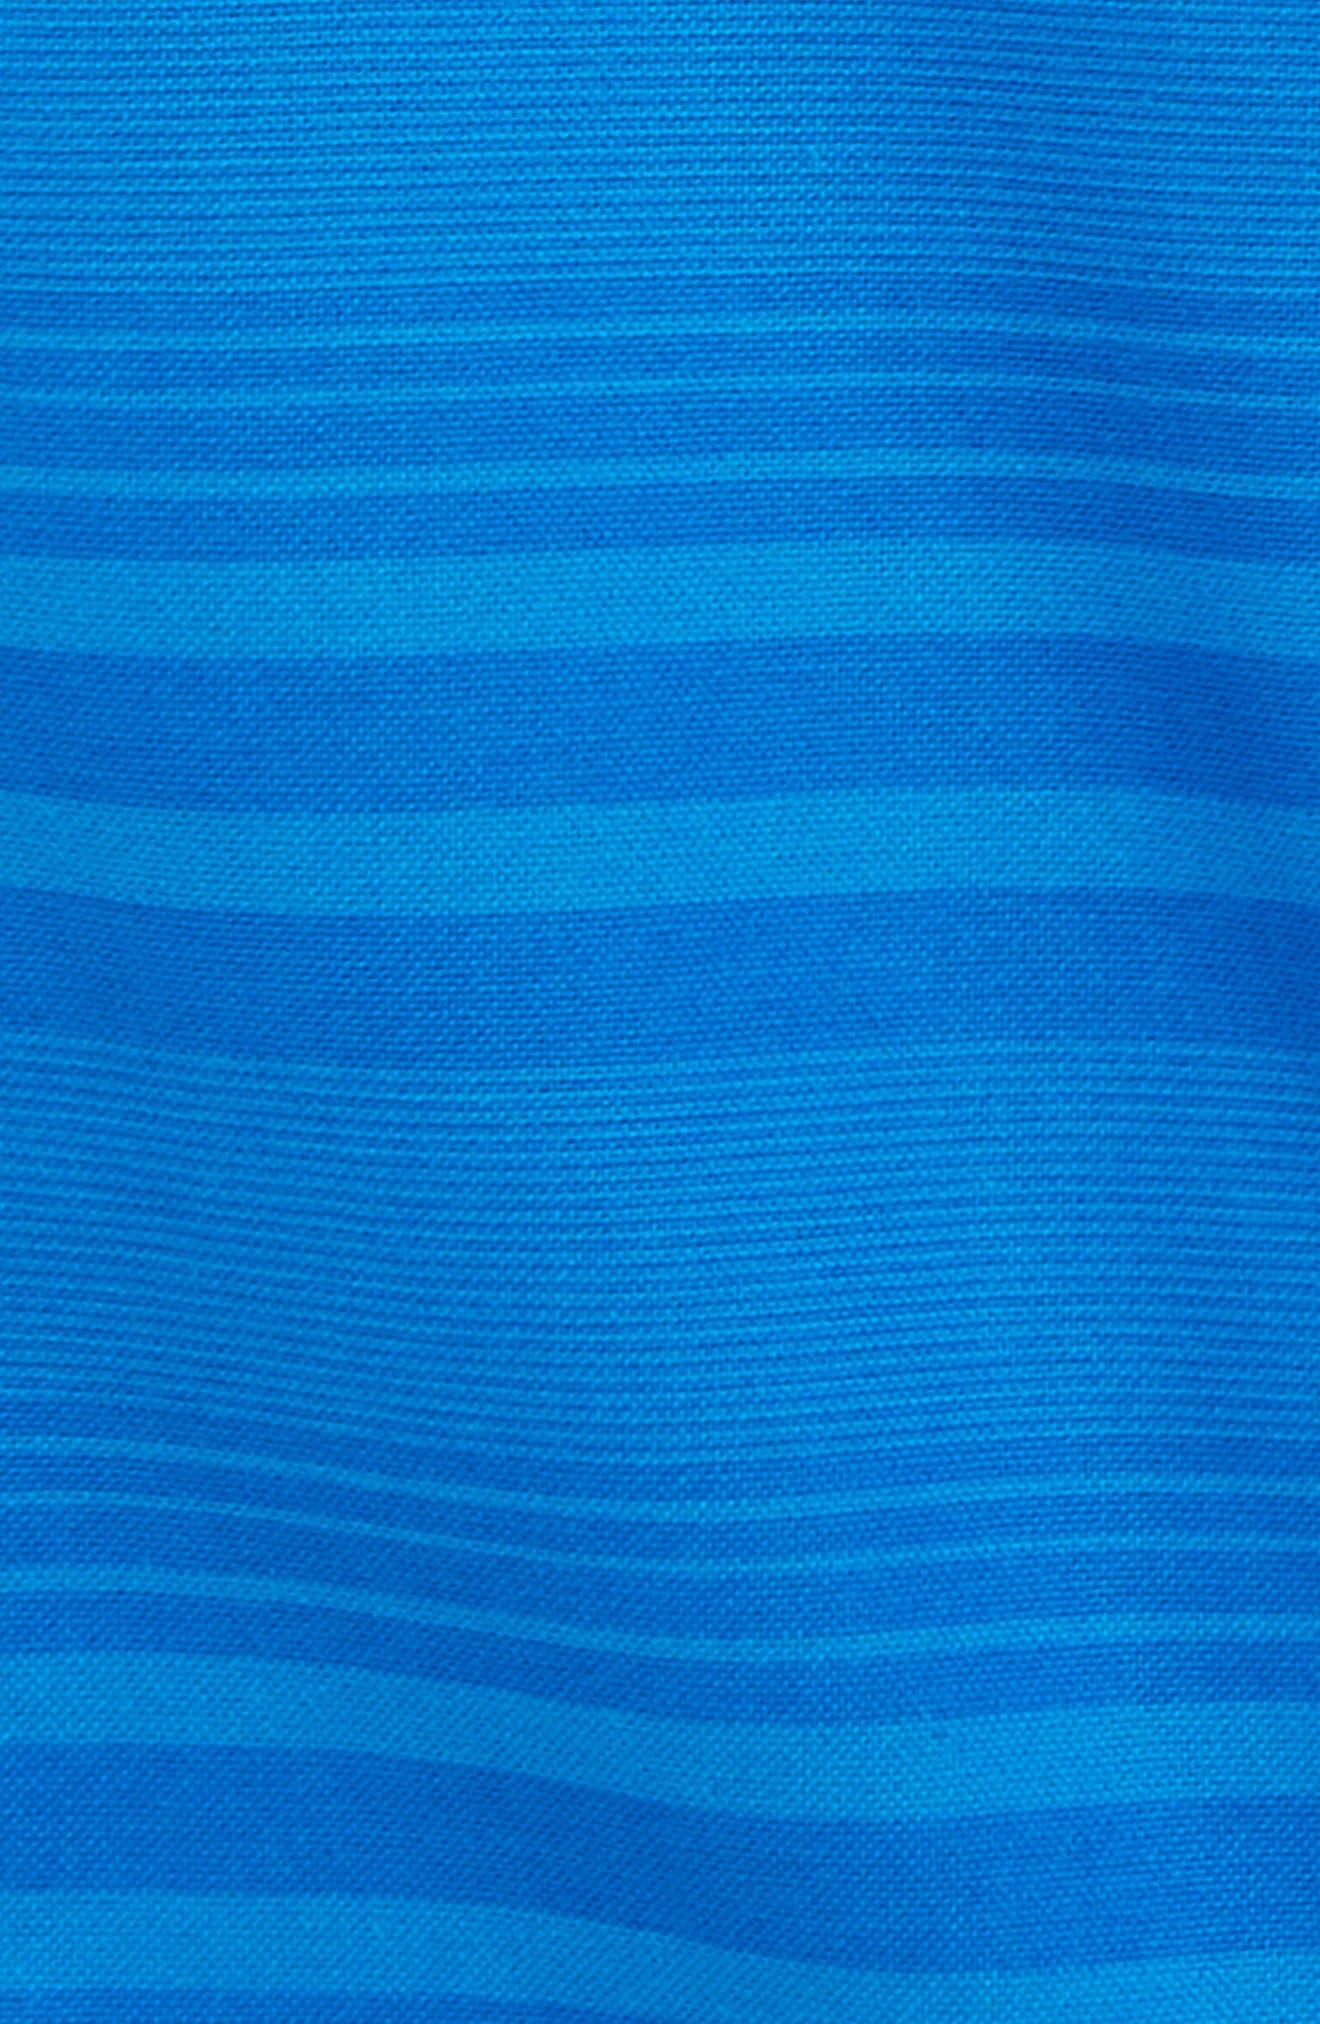 Jones Hybrid Shorts,                             Alternate thumbnail 2, color,                             Fountain Blue